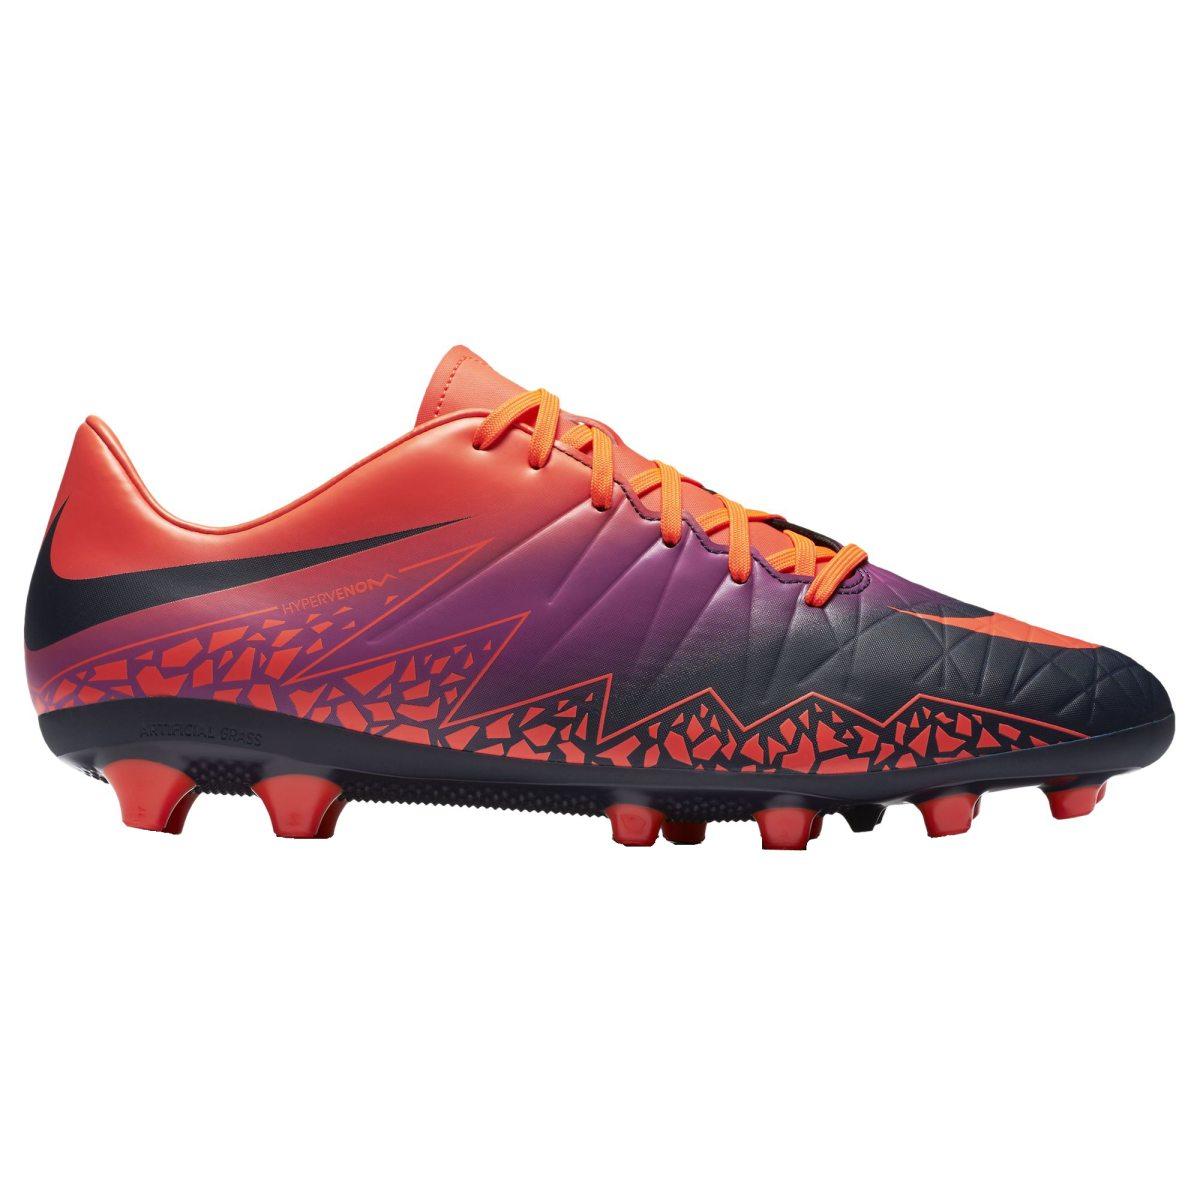 finest selection dbaaf b3064 nike hypervenom phelon ii ag q4 16 fotbollssko senior fotbollsskor